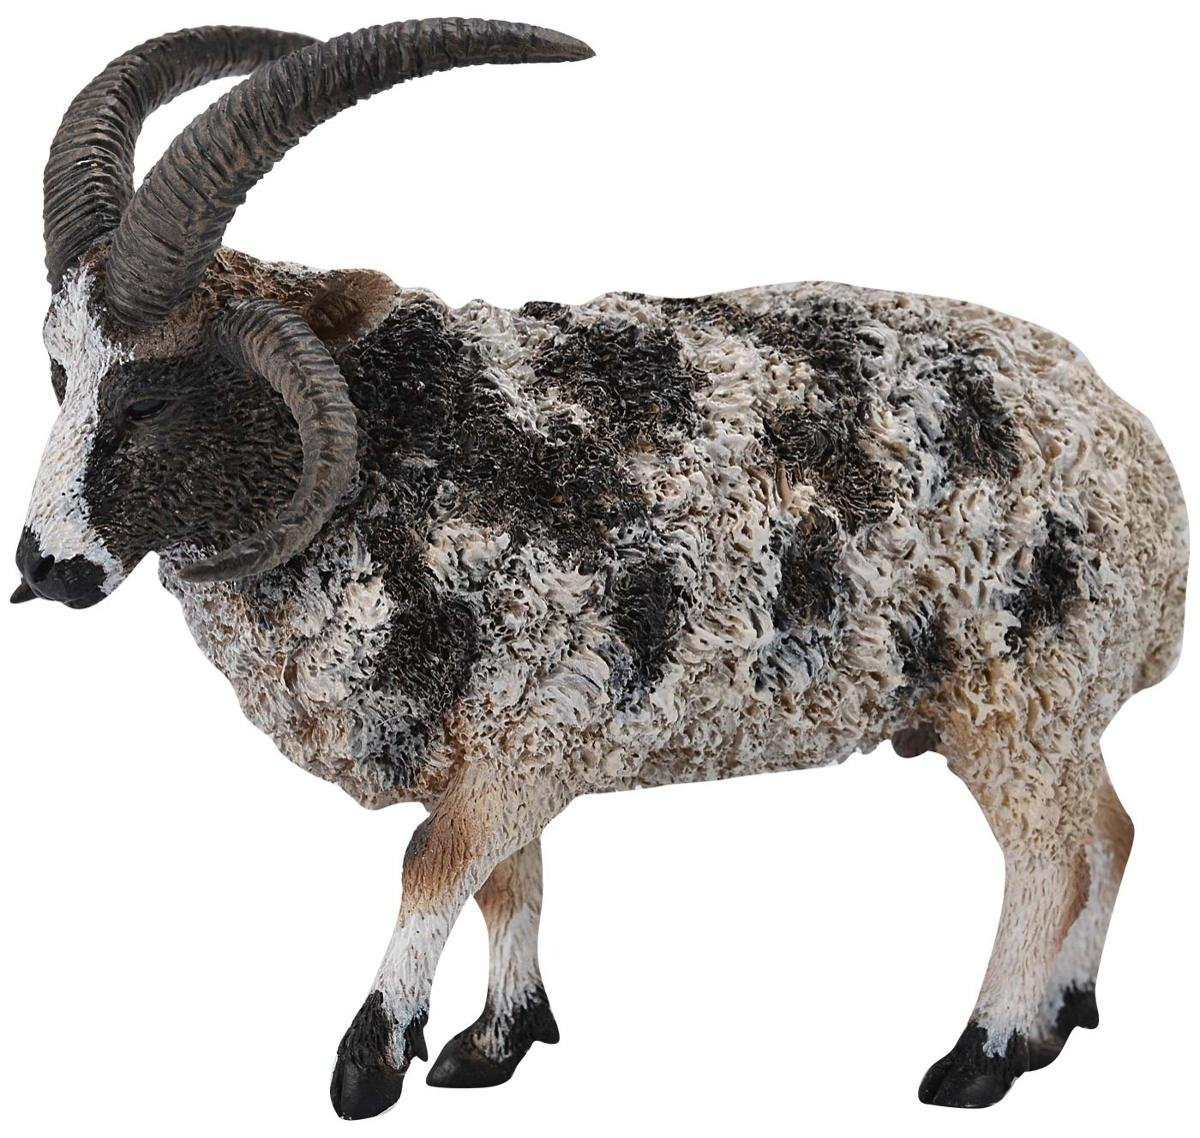 Фигурка Gulliver Collecta - Овца четырехрогая, LНа ферме (Farm life)<br>Фигурка Gulliver Collecta - Овца четырехрогая, L<br>